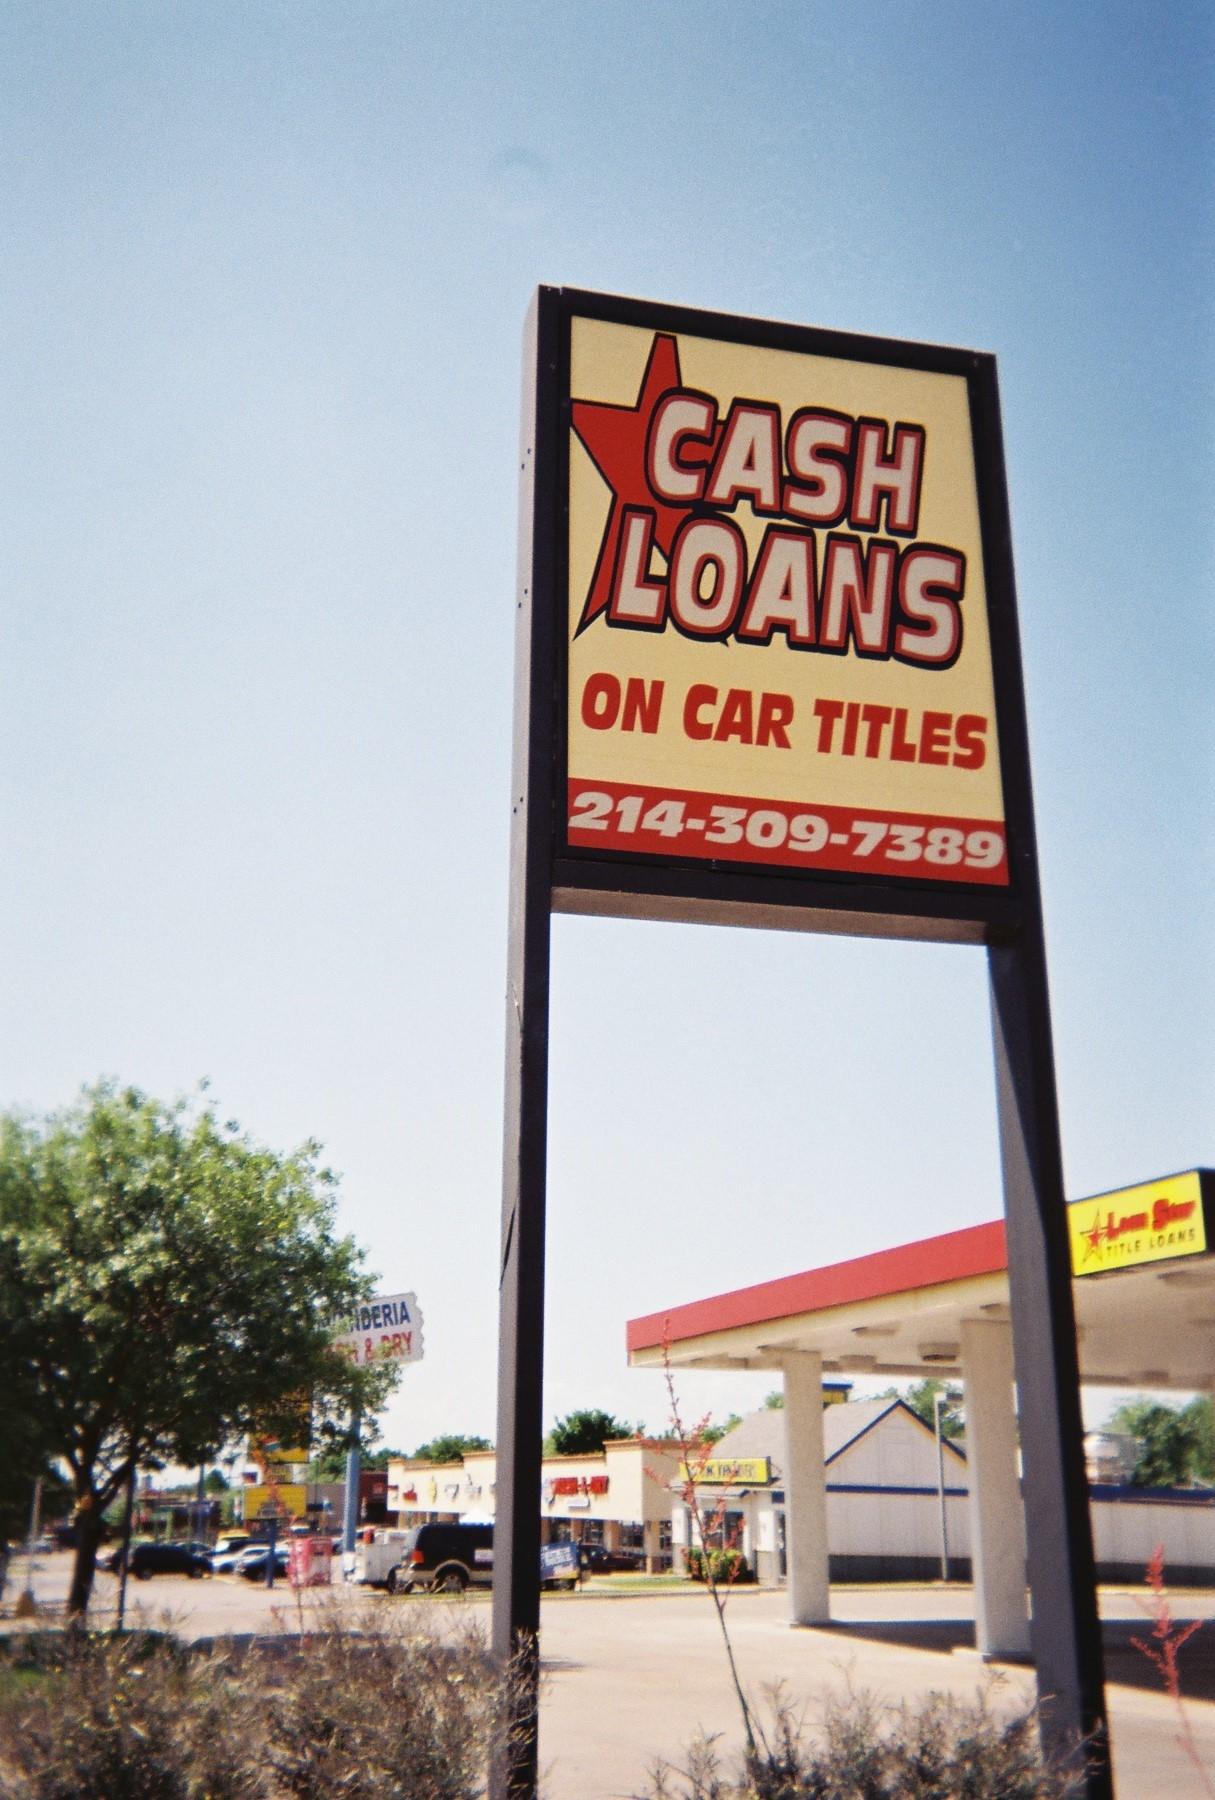 Texas Car Title Payday Loan Services Inc Dallas Tx